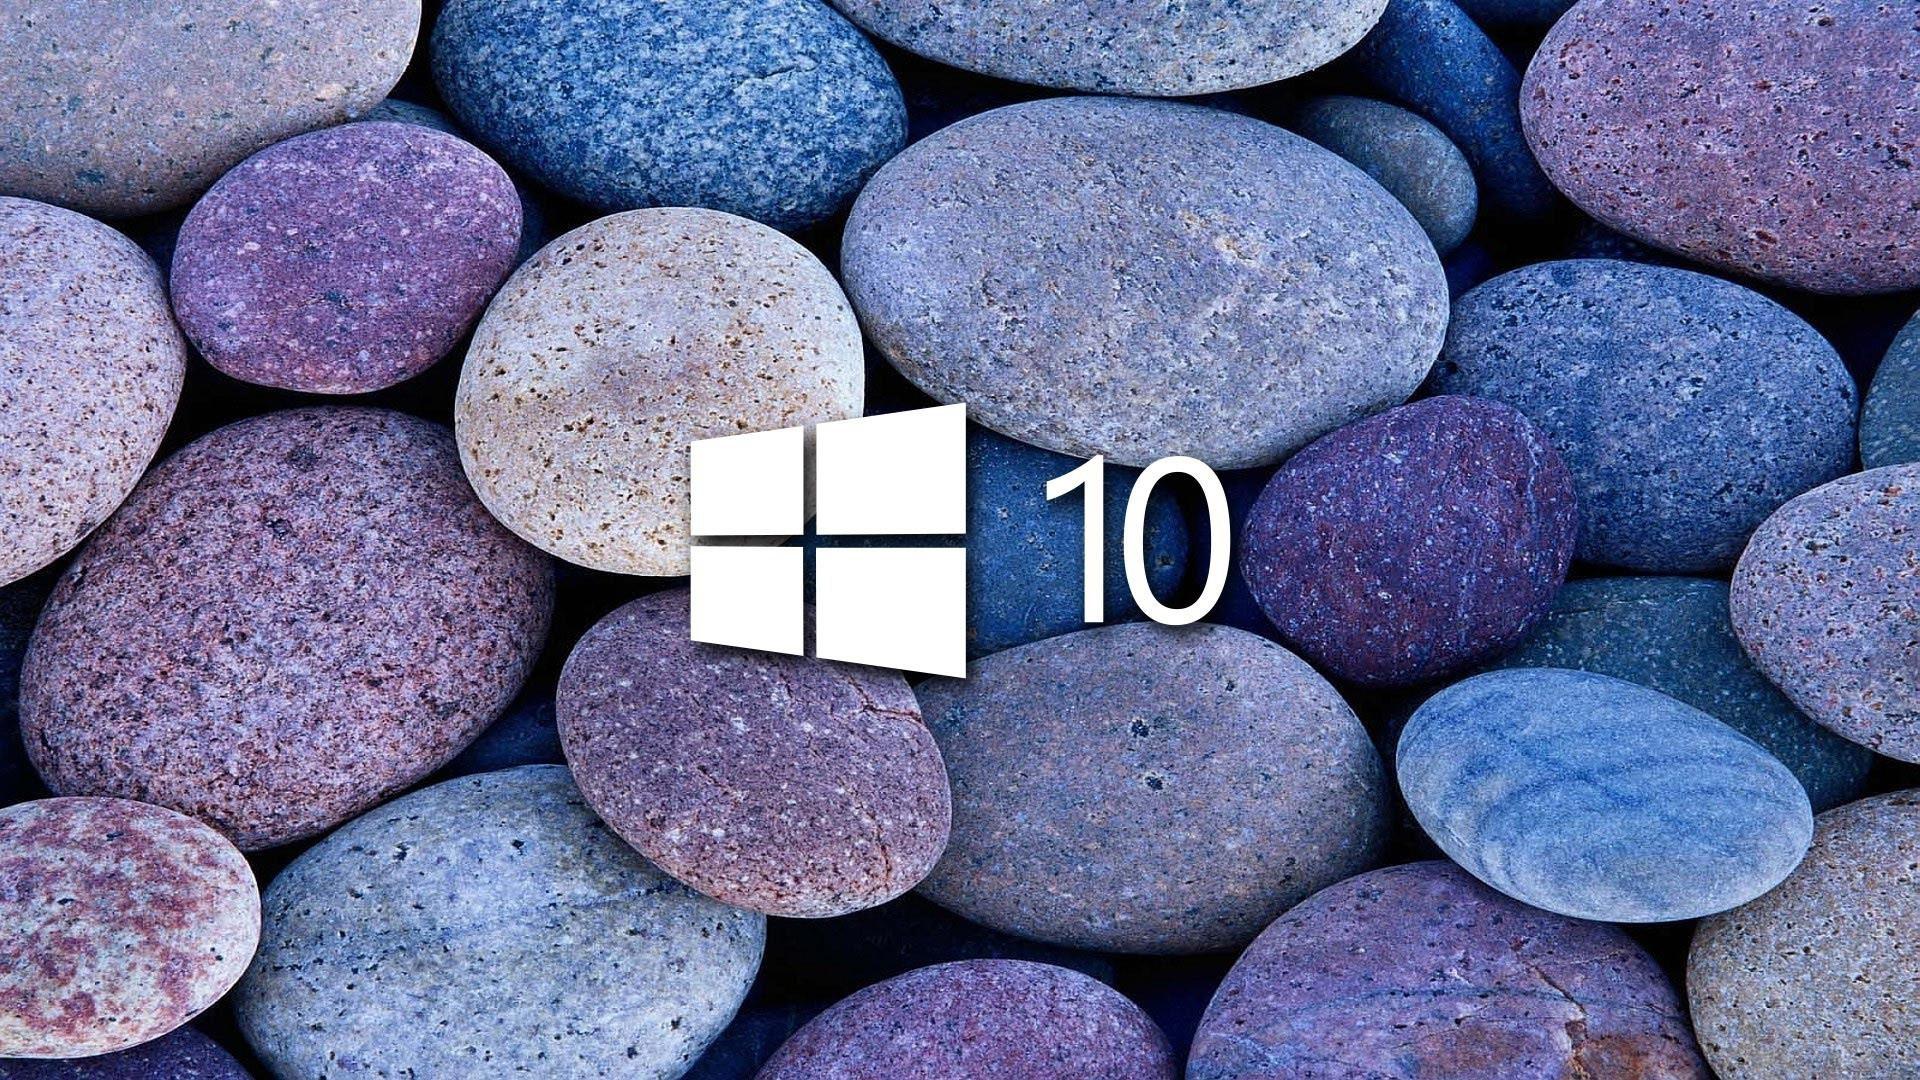 white windows 10 on blue and purple stones